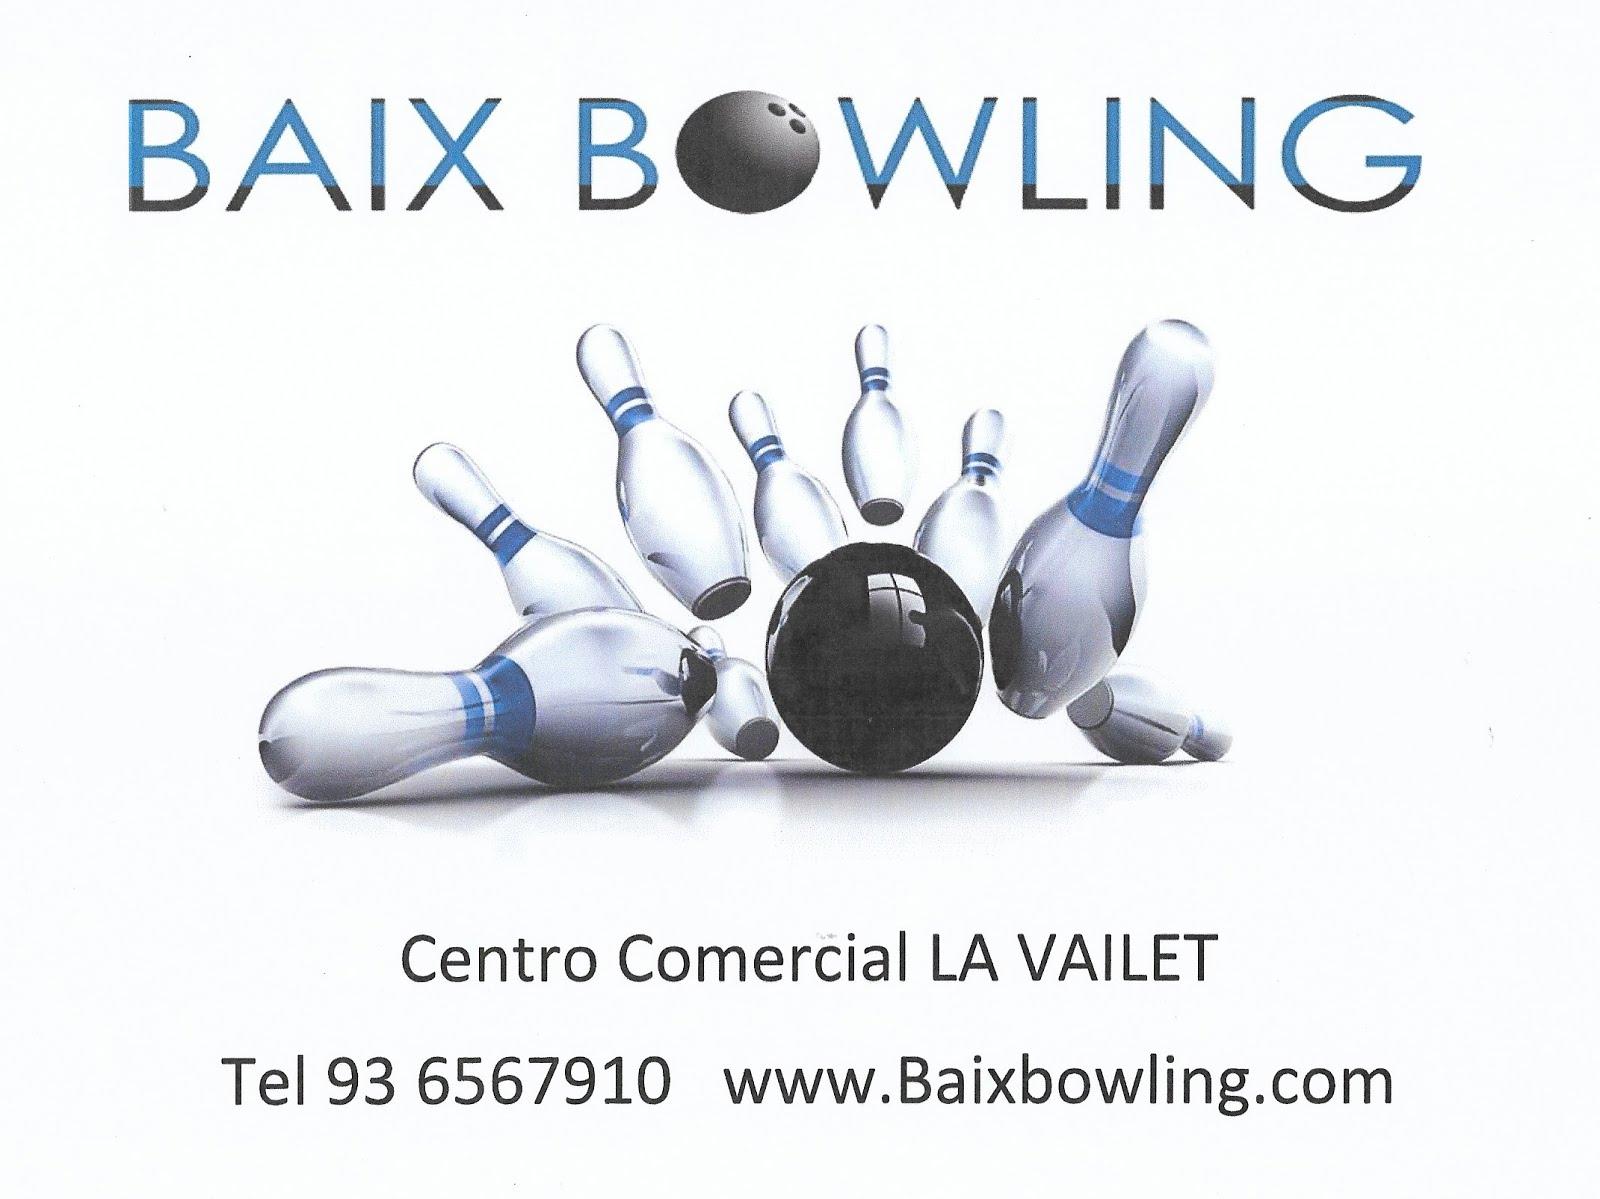 BAIX BOWLING